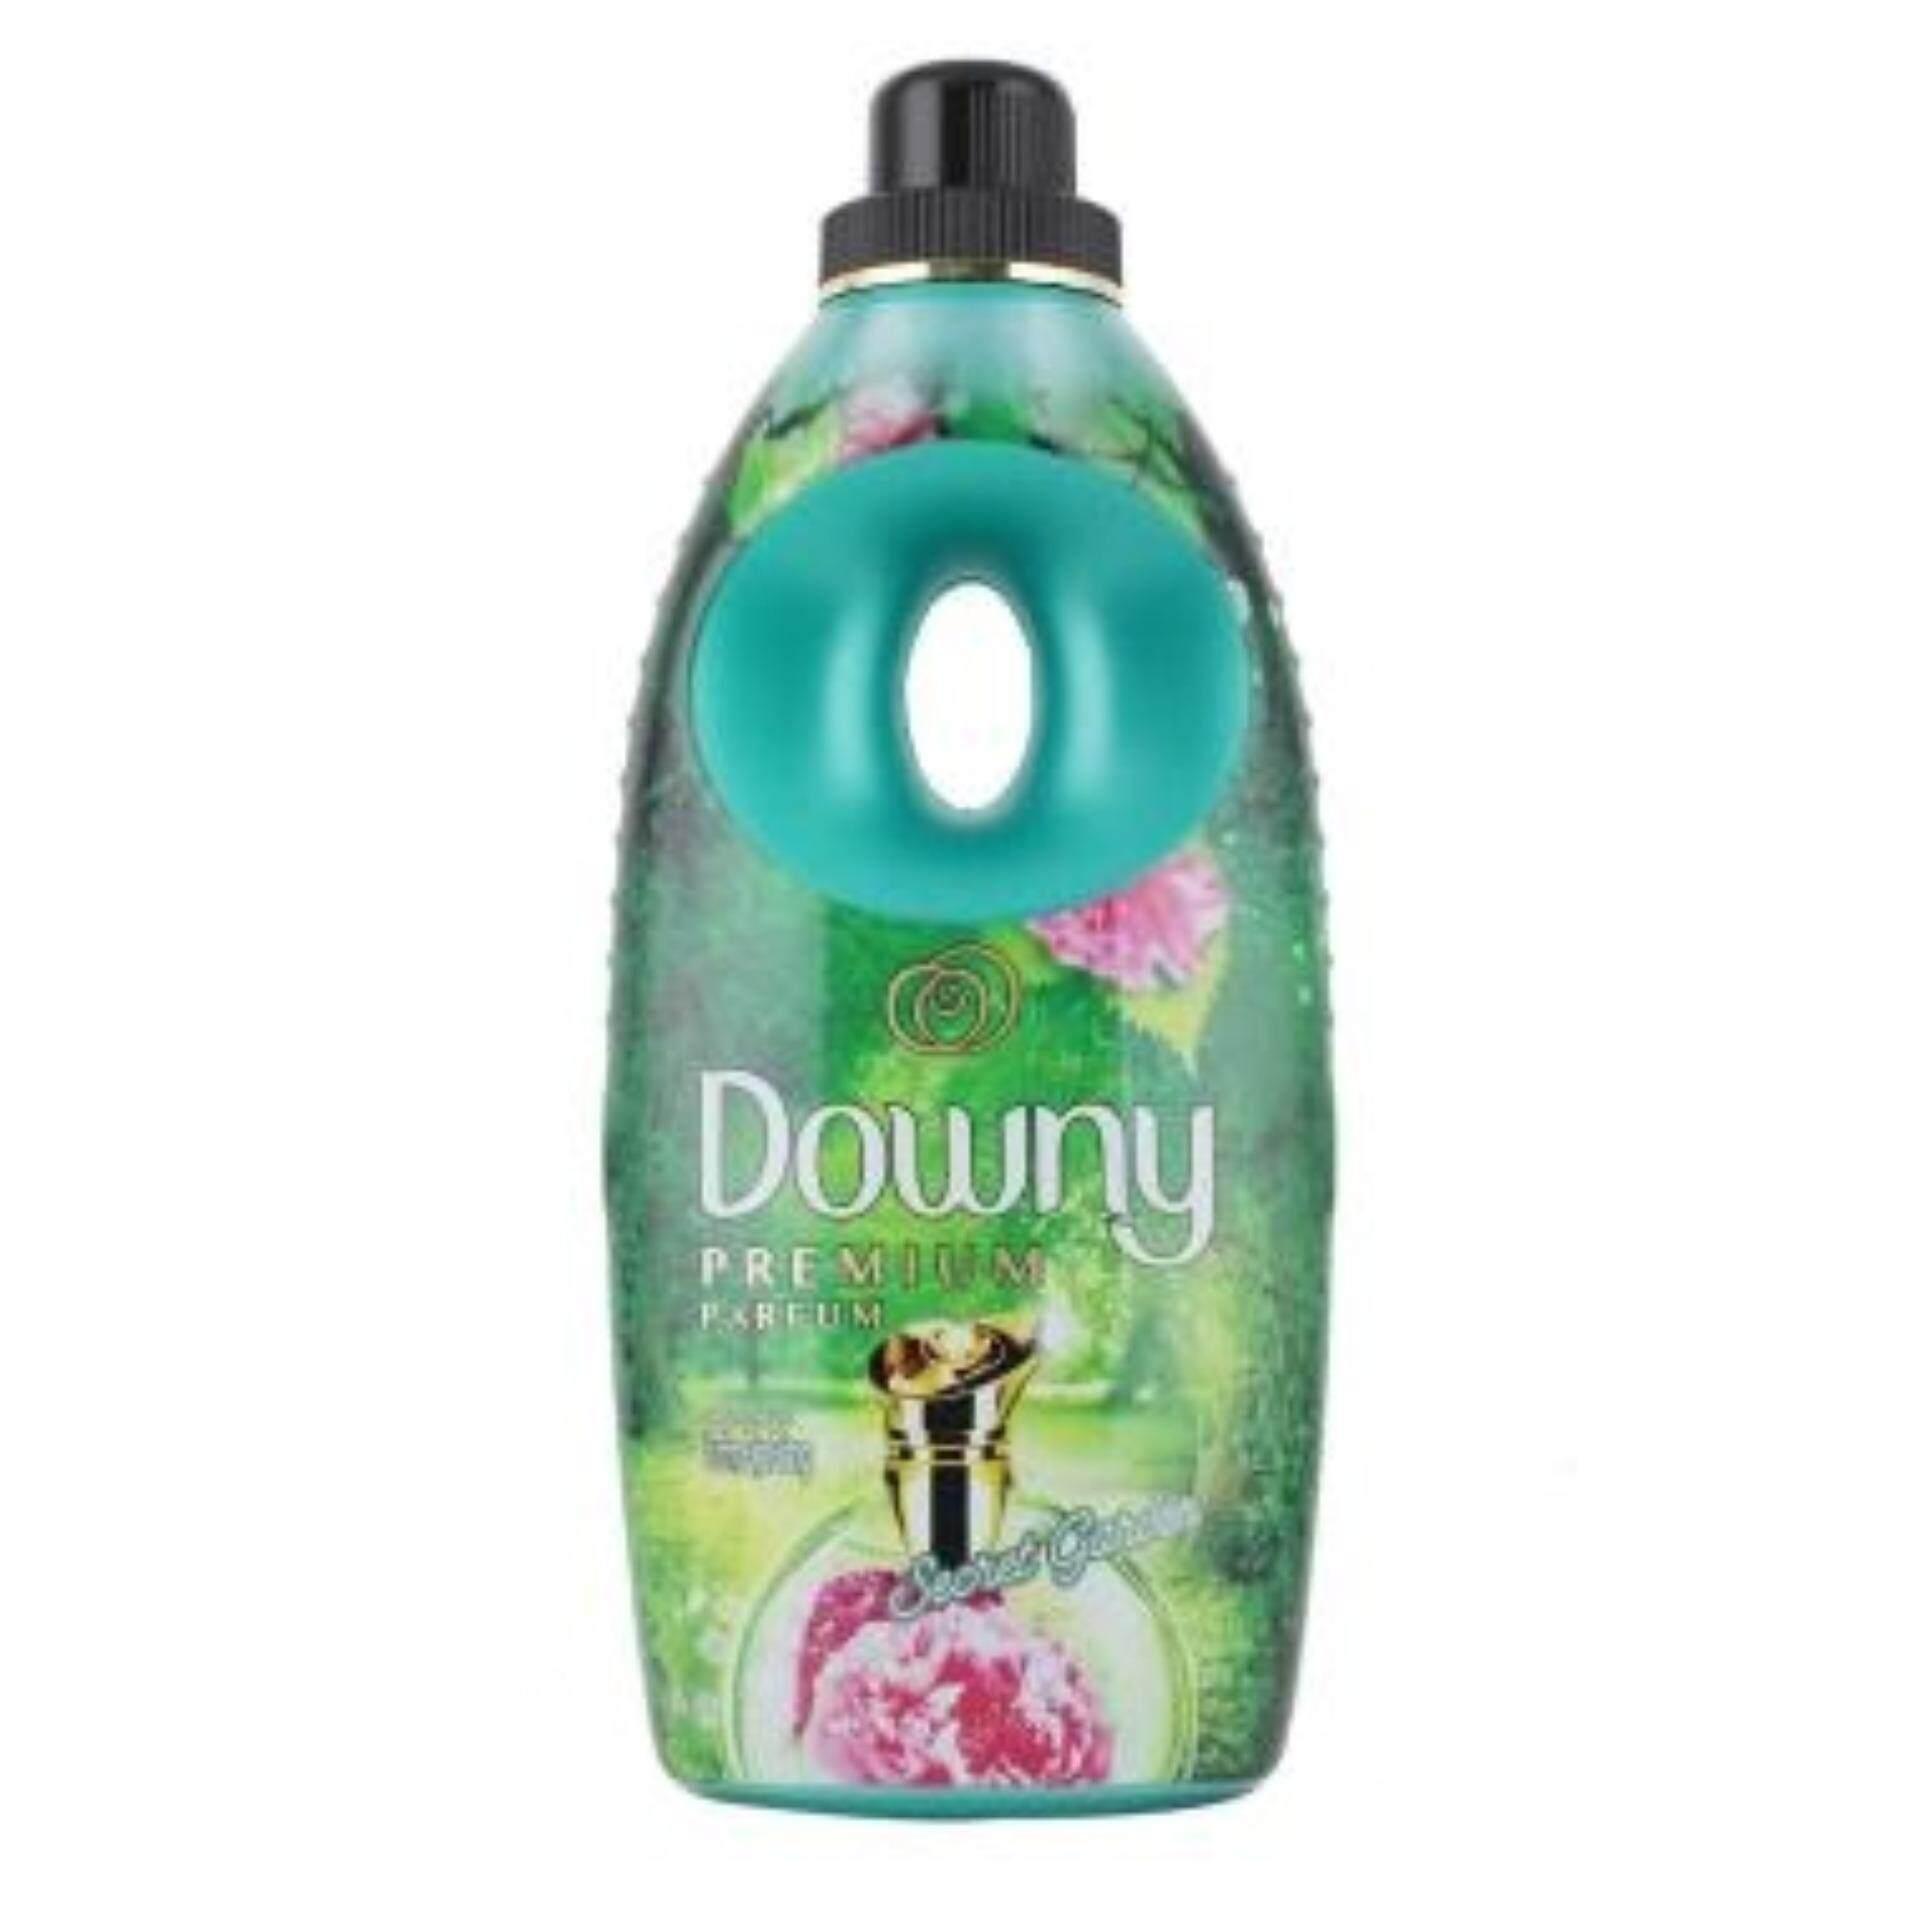 Downy Premium Parfum Softener Secret Garden 800ml